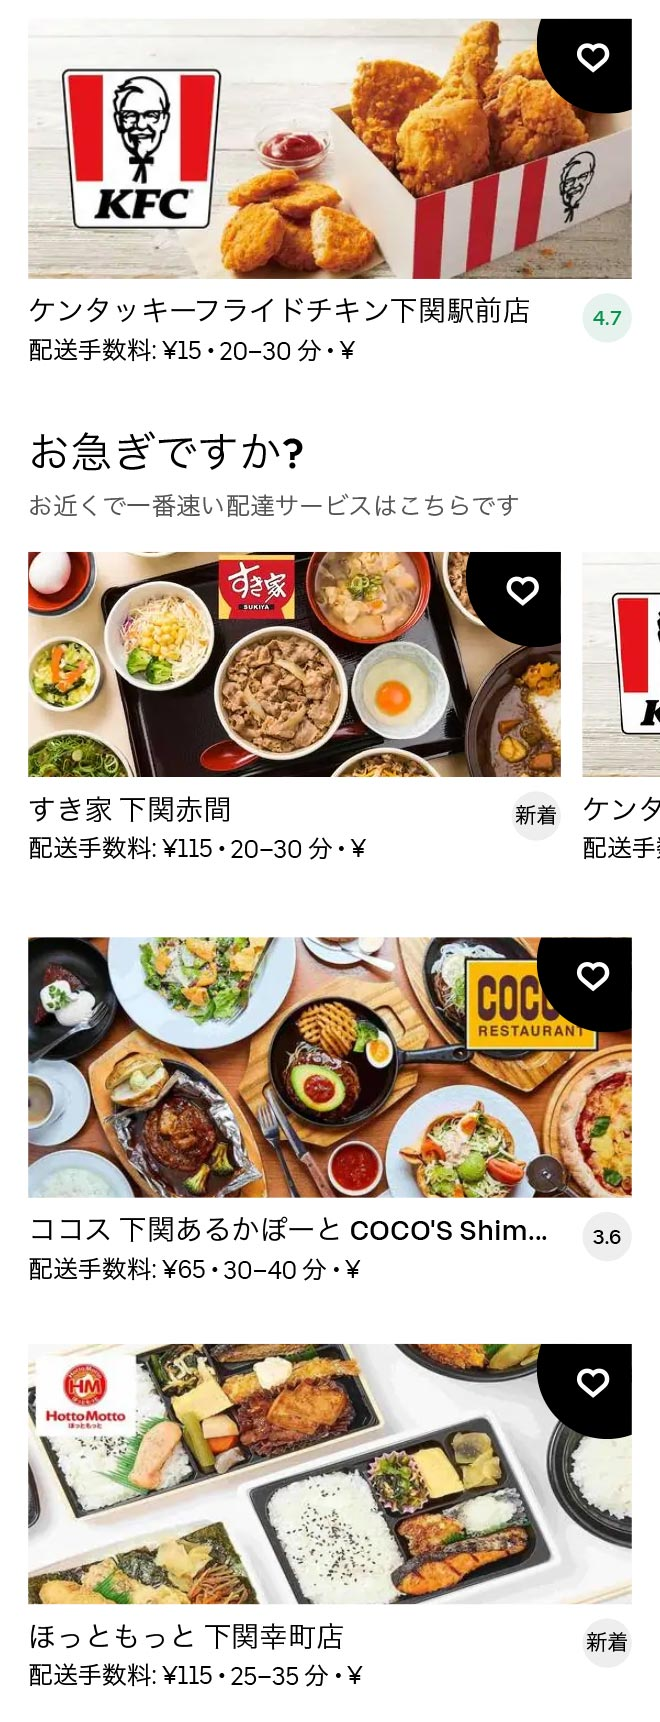 U shimonoseki 2104 01